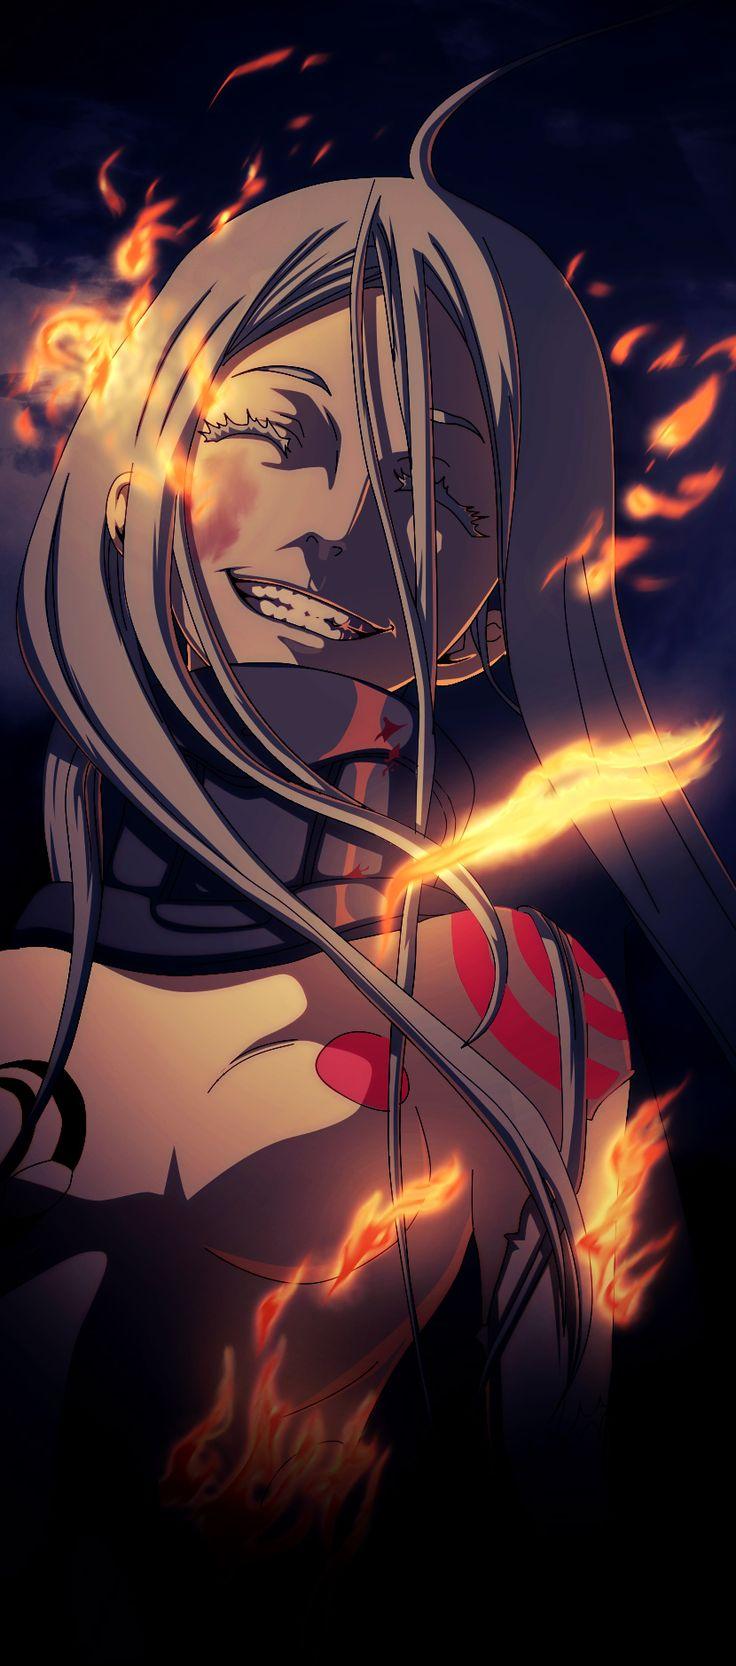 Deadman Wonderland Shiro is one of my fav characters ever